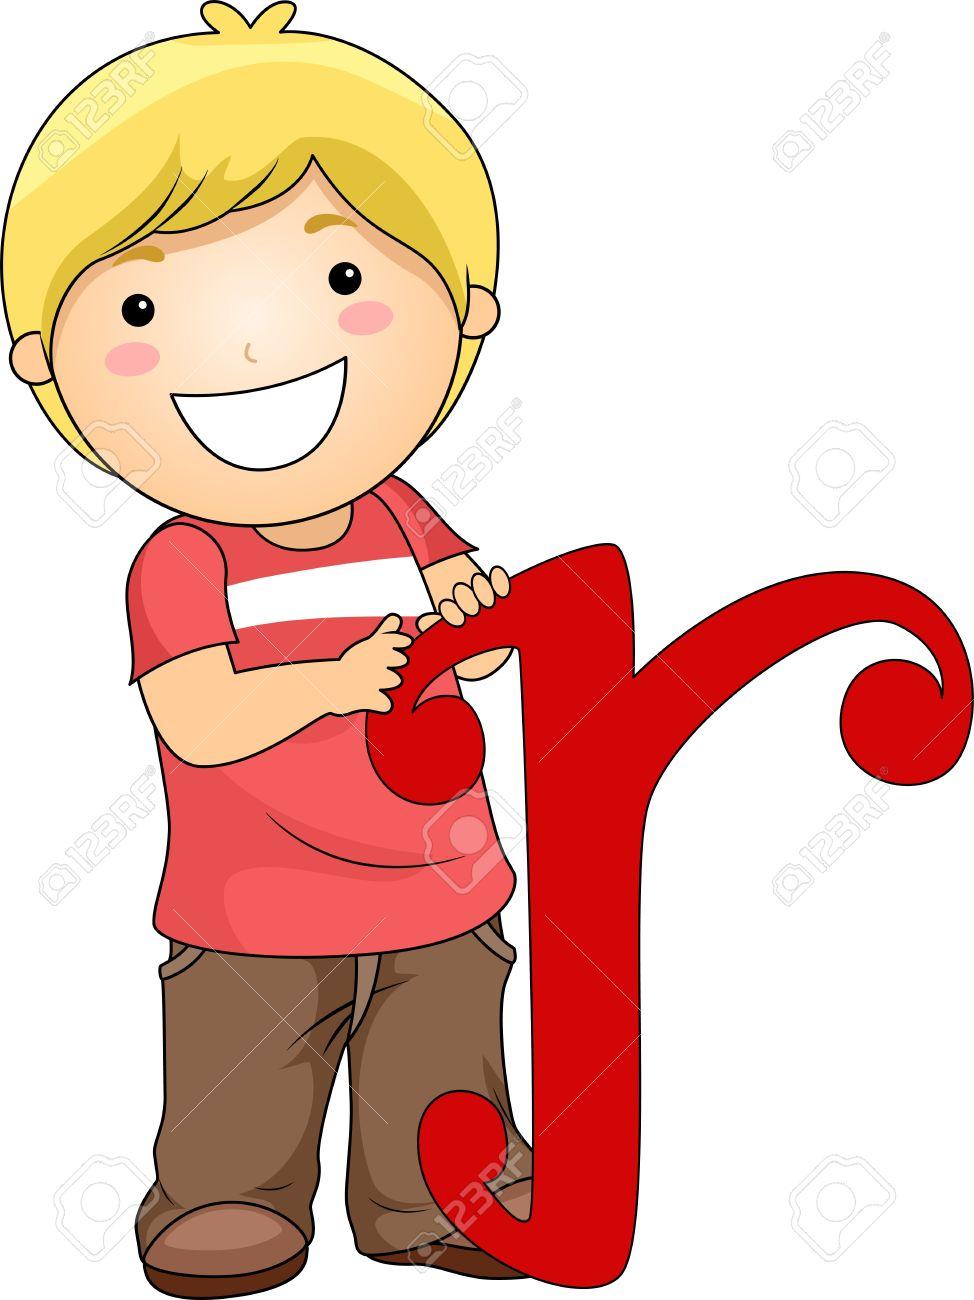 Kids holding alphabet letters clipart png royalty free Kids holding alphabet letters clipart - ClipartFest png royalty free